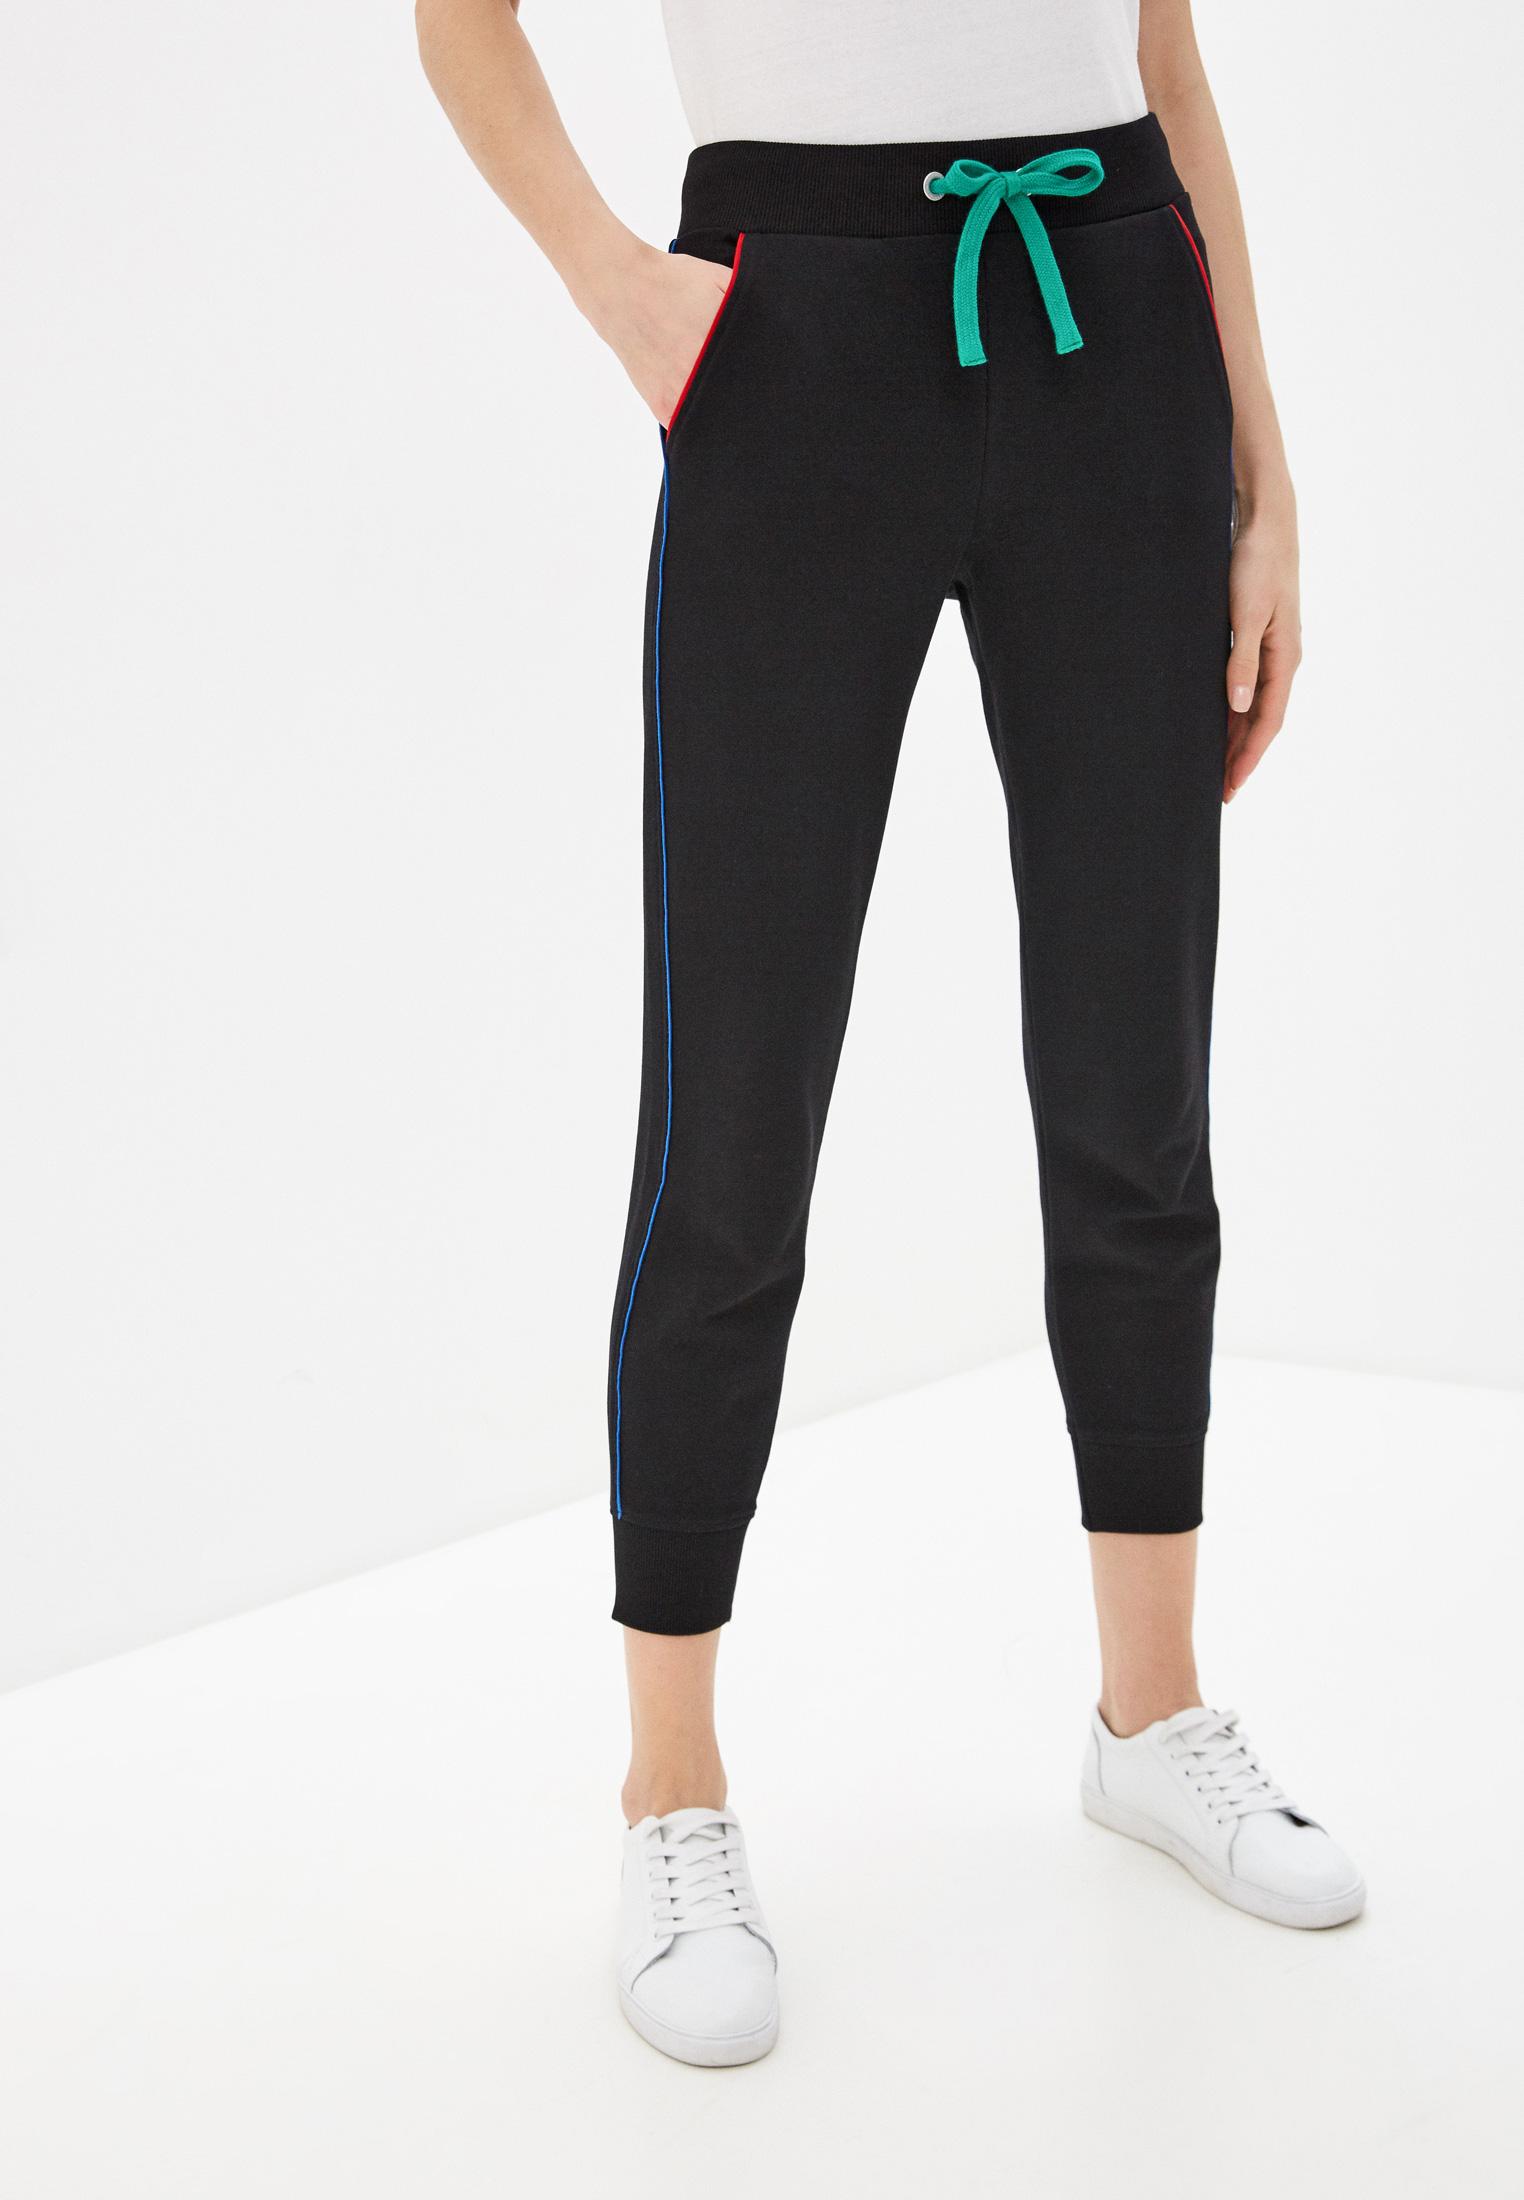 Женские спортивные брюки United Colors of Benetton (Юнайтед Колорс оф Бенеттон) 3J68P0472